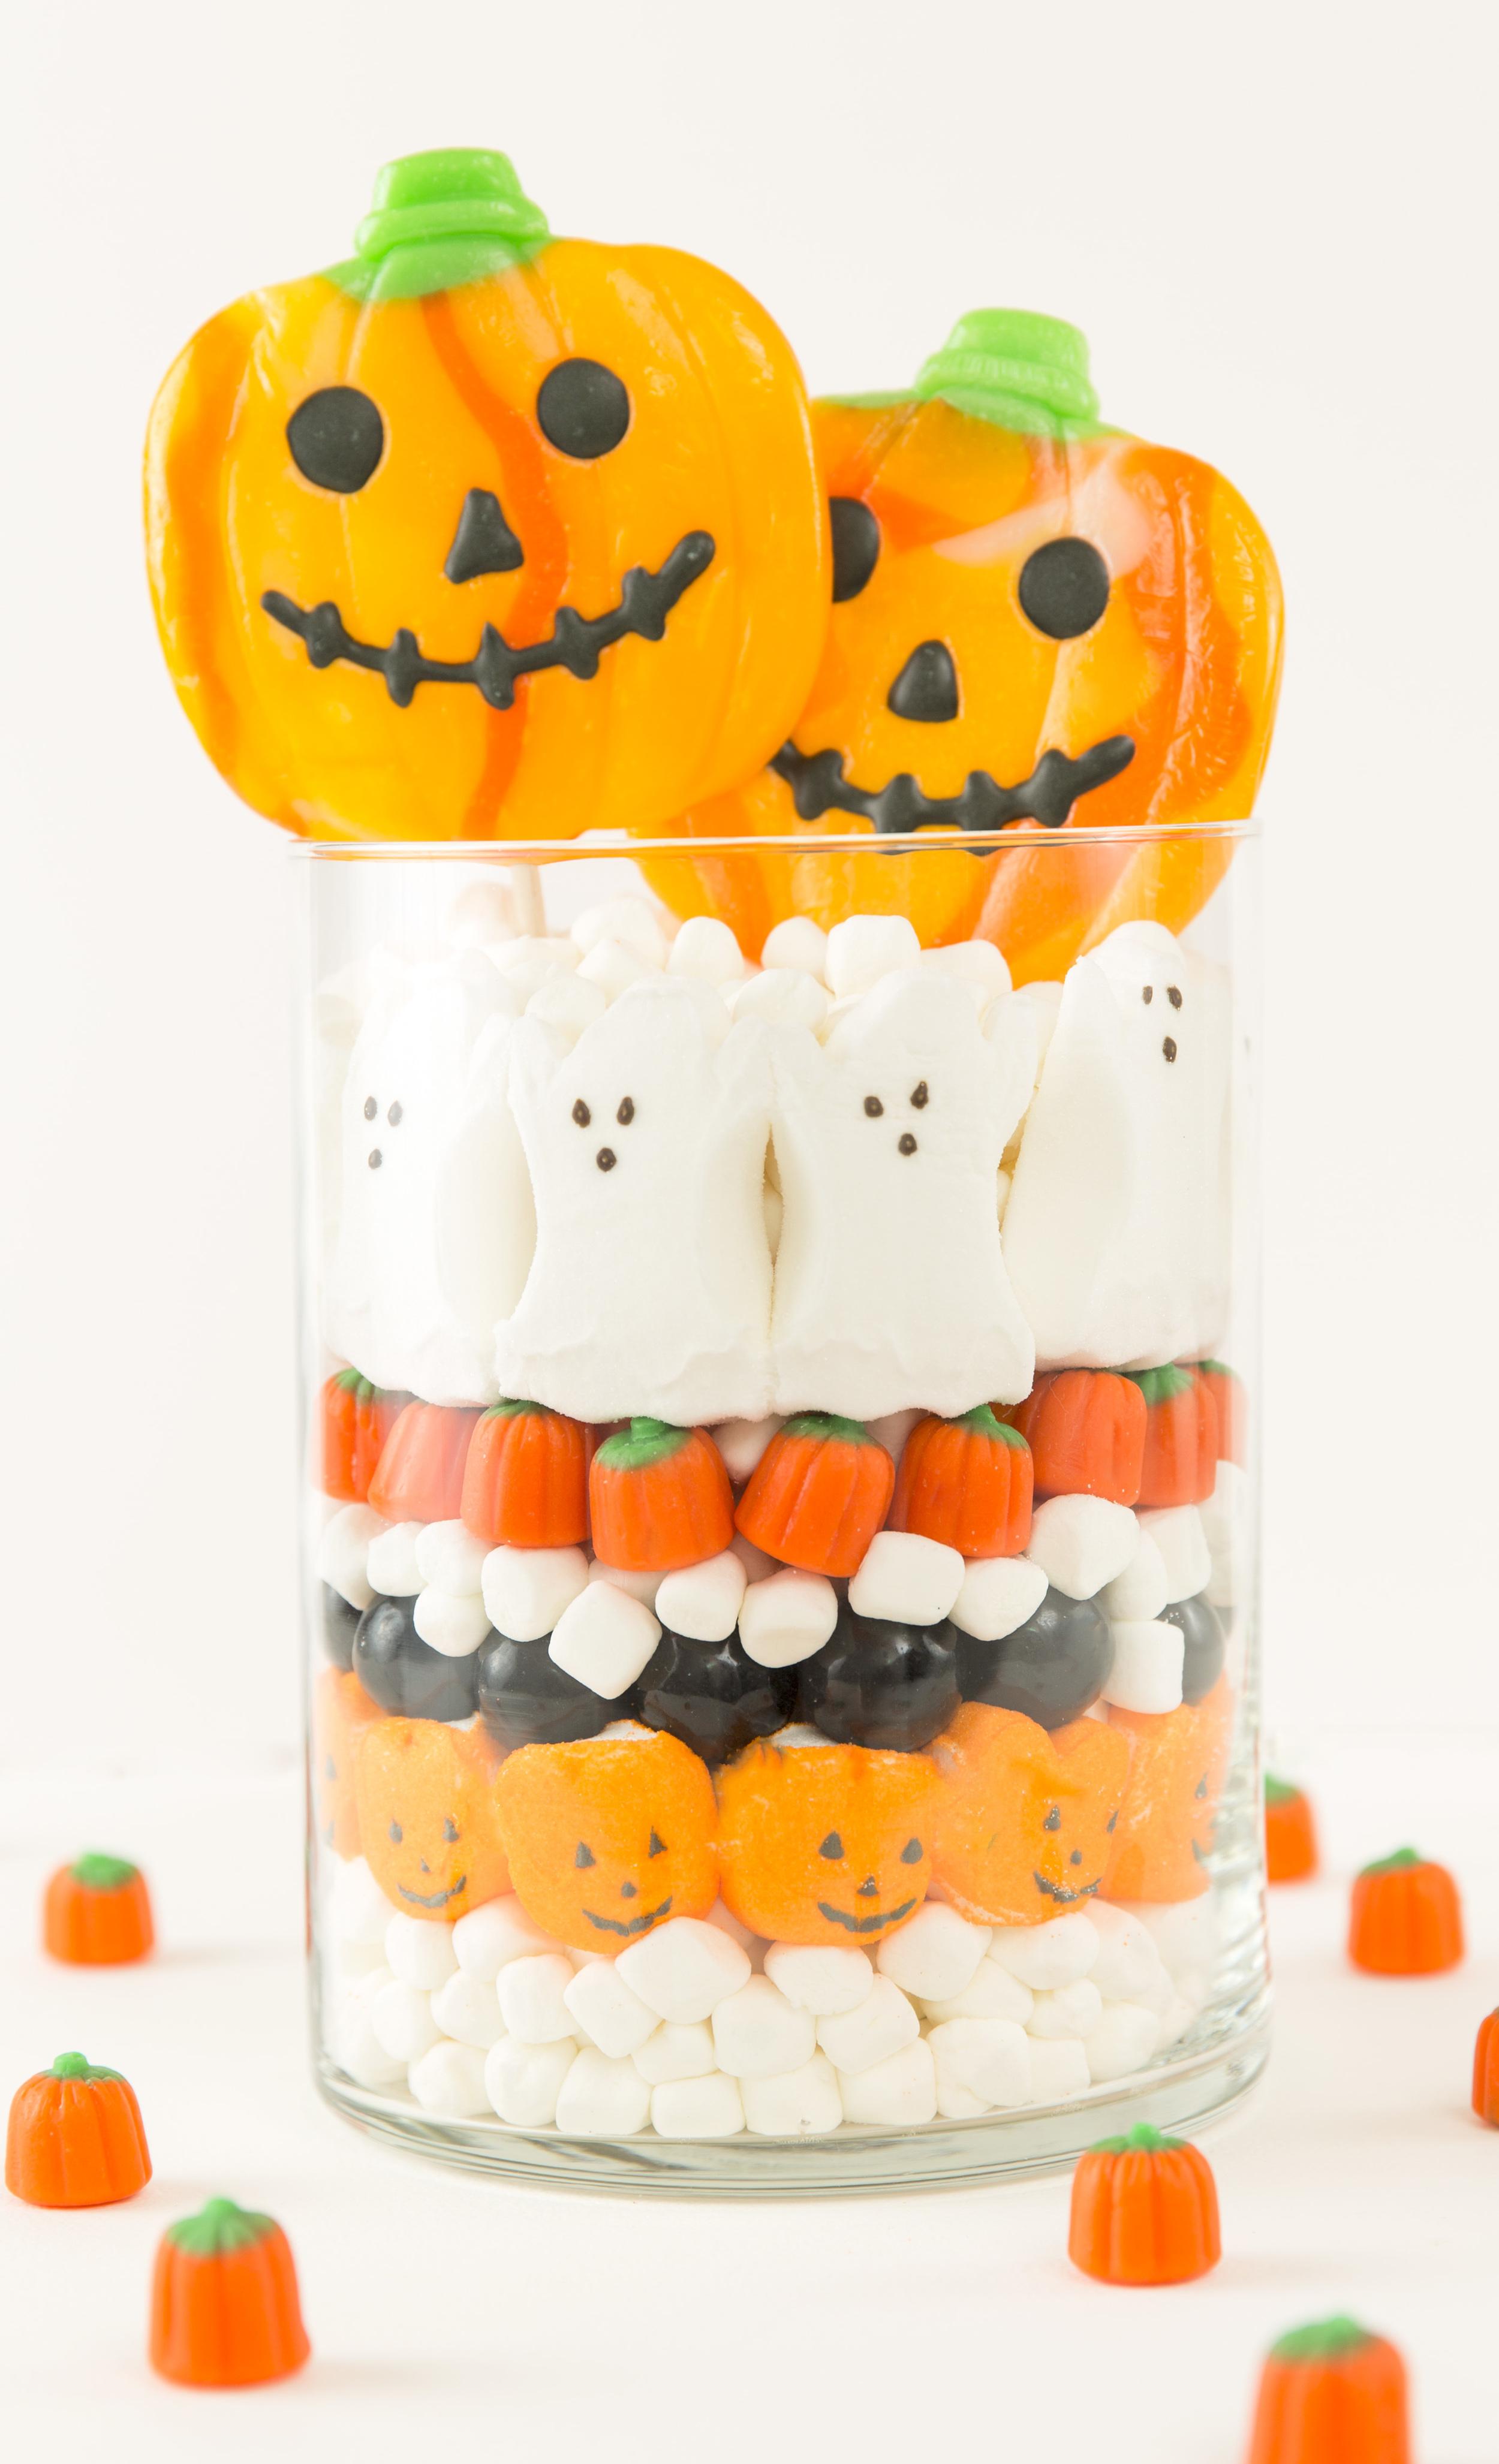 Cute Halloween Centerpiece DIY